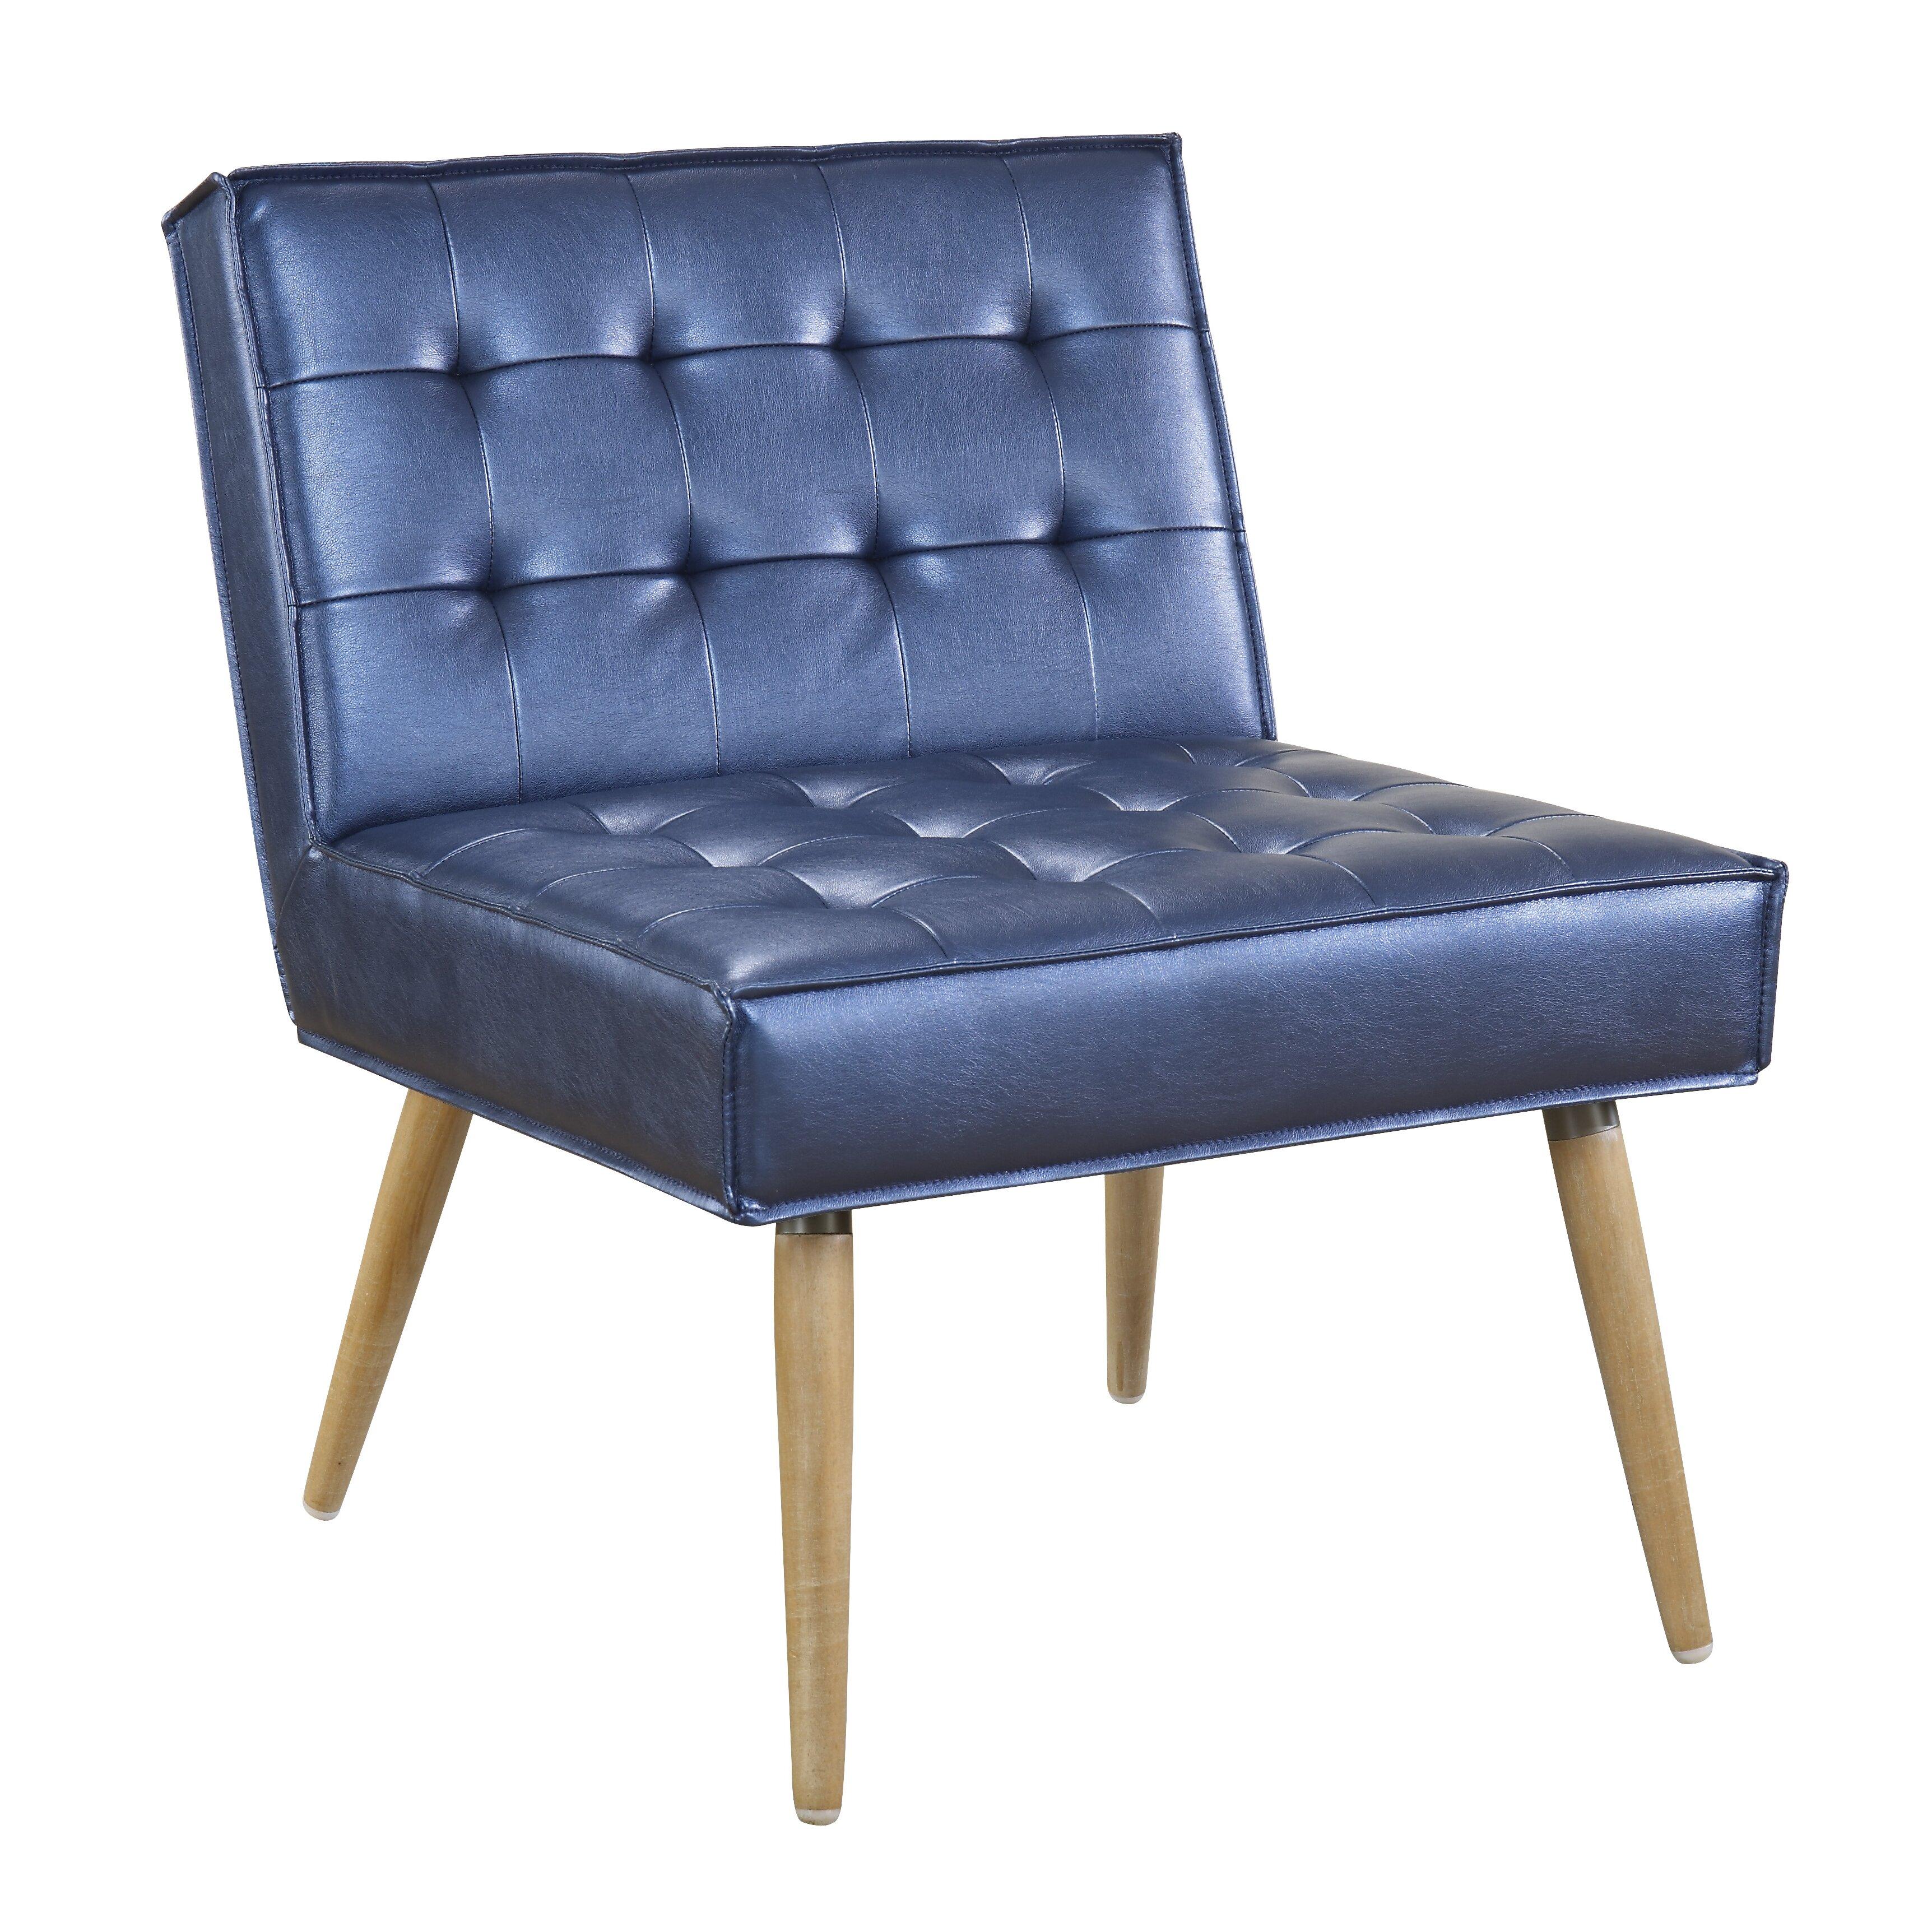 Furniture Accent Furniture Accent Chairs Ave Six SKU: AVS2275